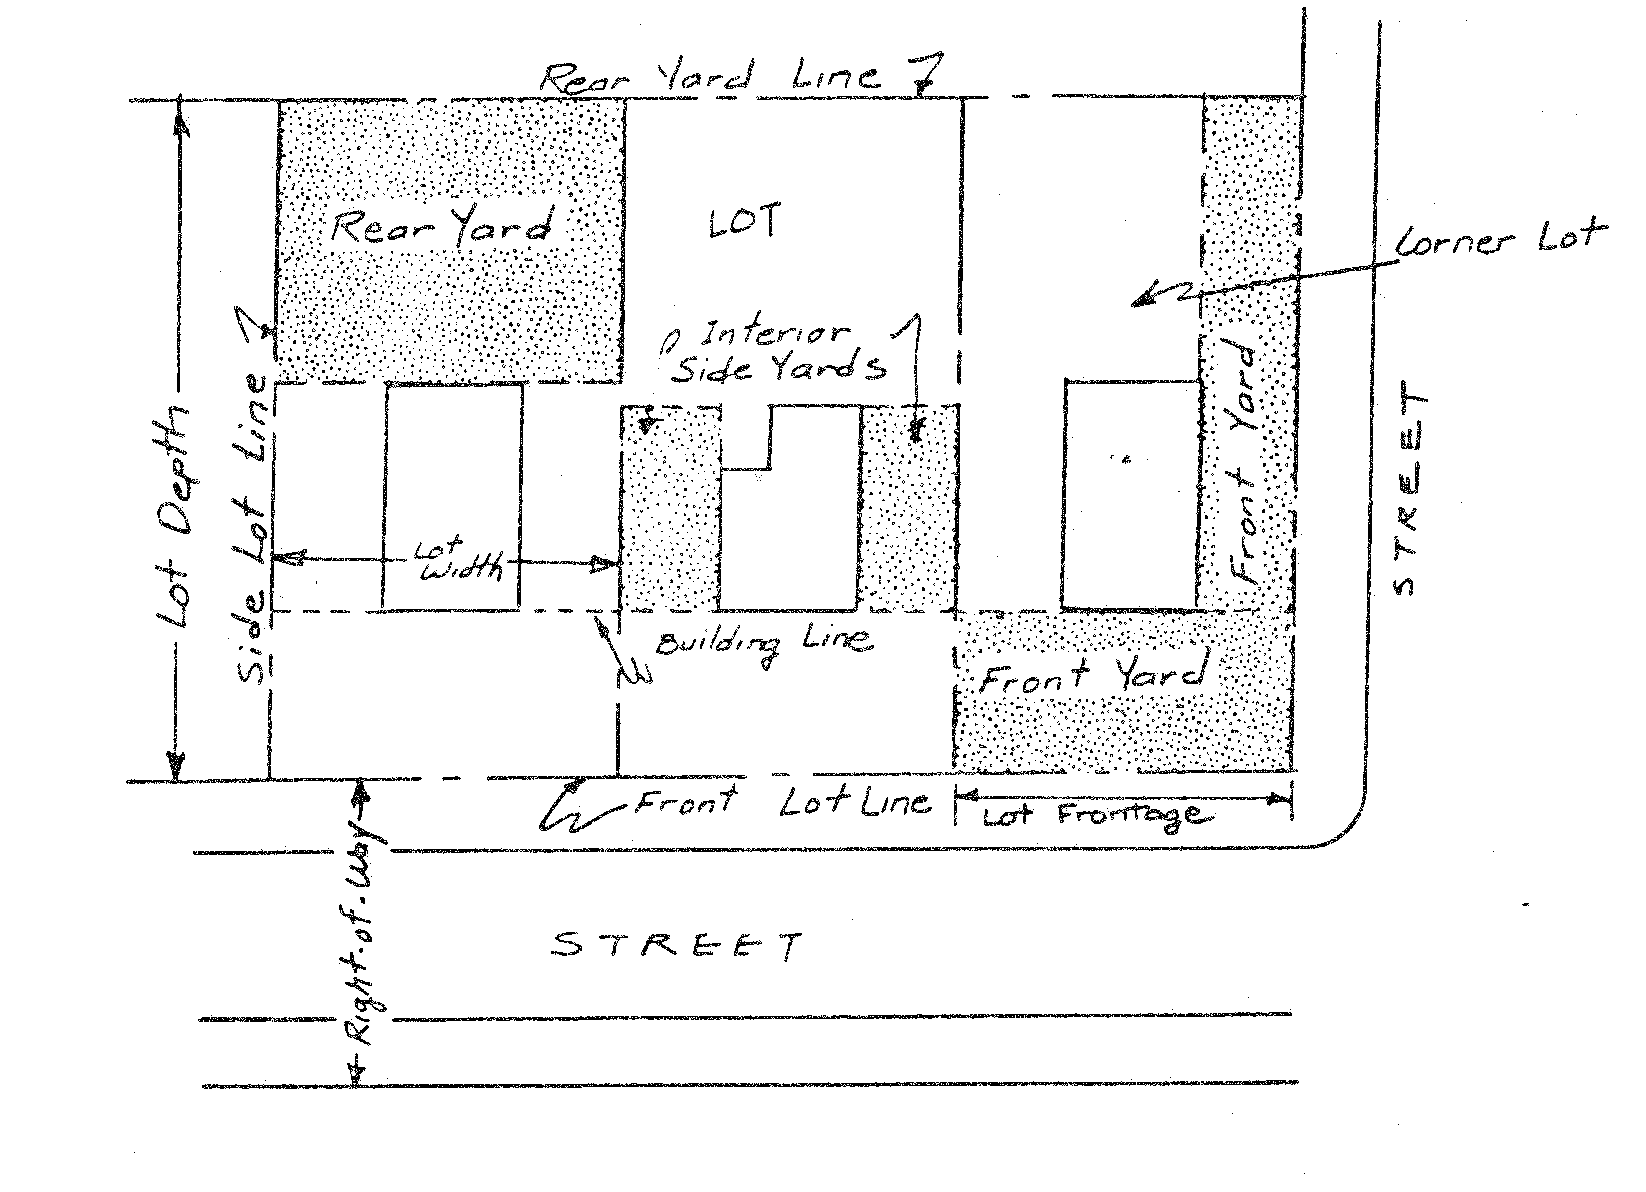 Generator Wiring Diagram Also Case 621b Parts Diagrams Moreover Case